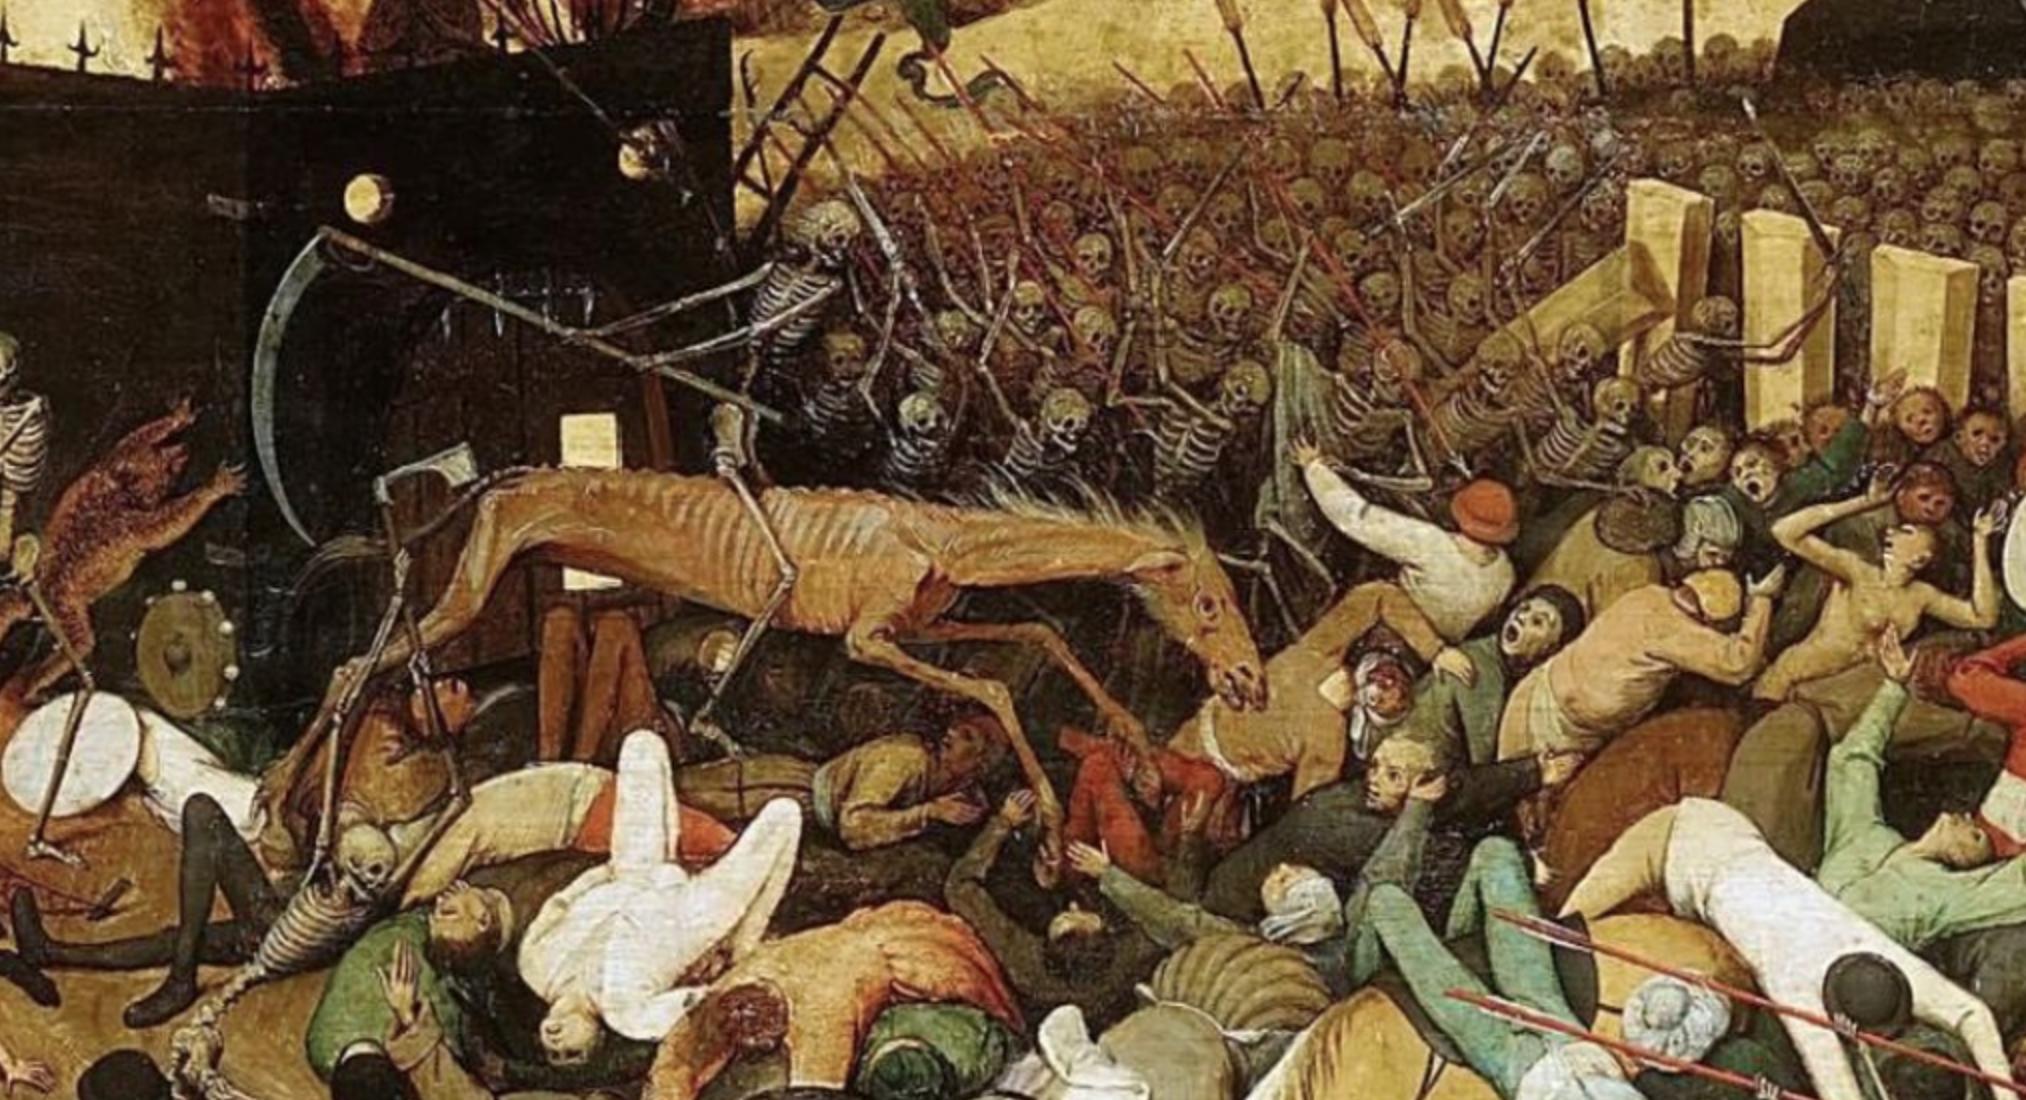 14th century battle